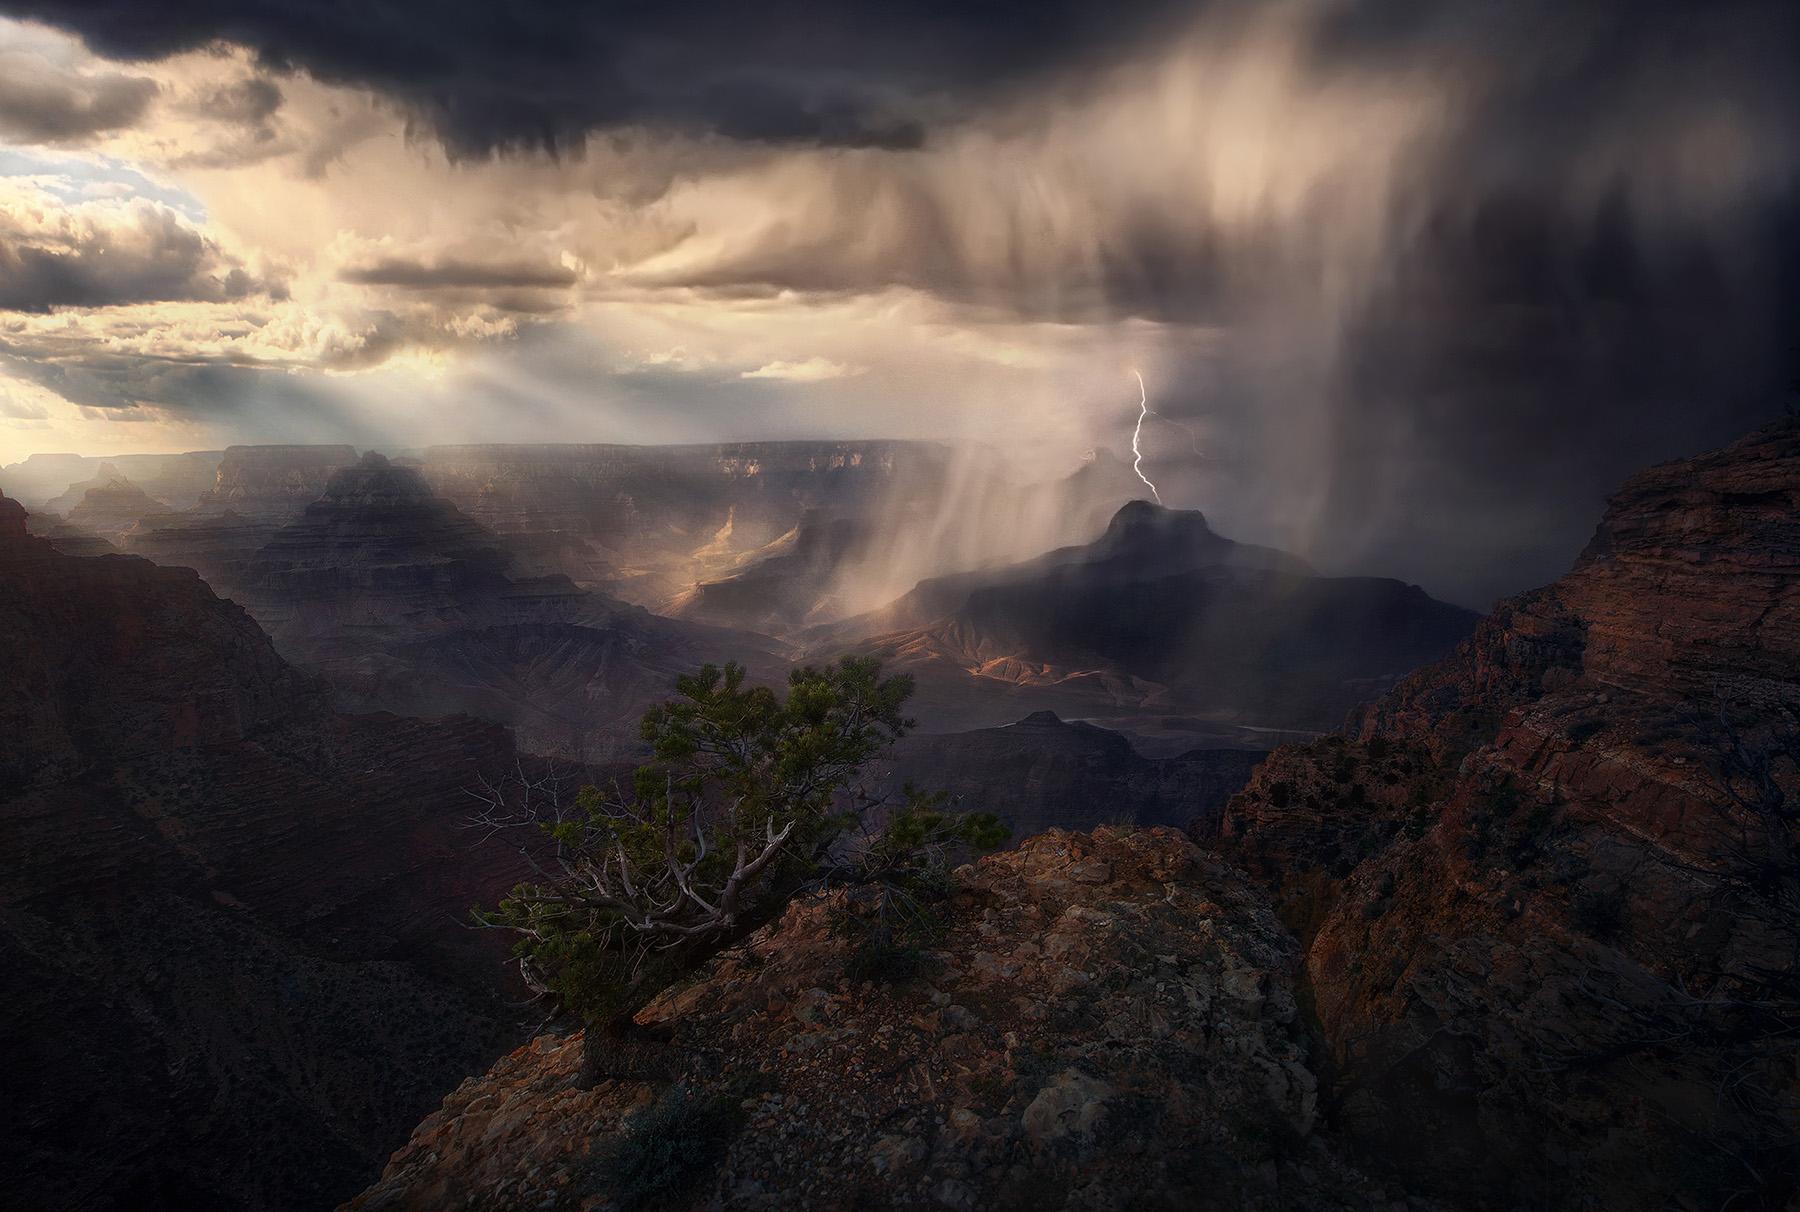 Arizona, Monsoon, Grand Canyon, Lightning, Storm, Rainfall, photo